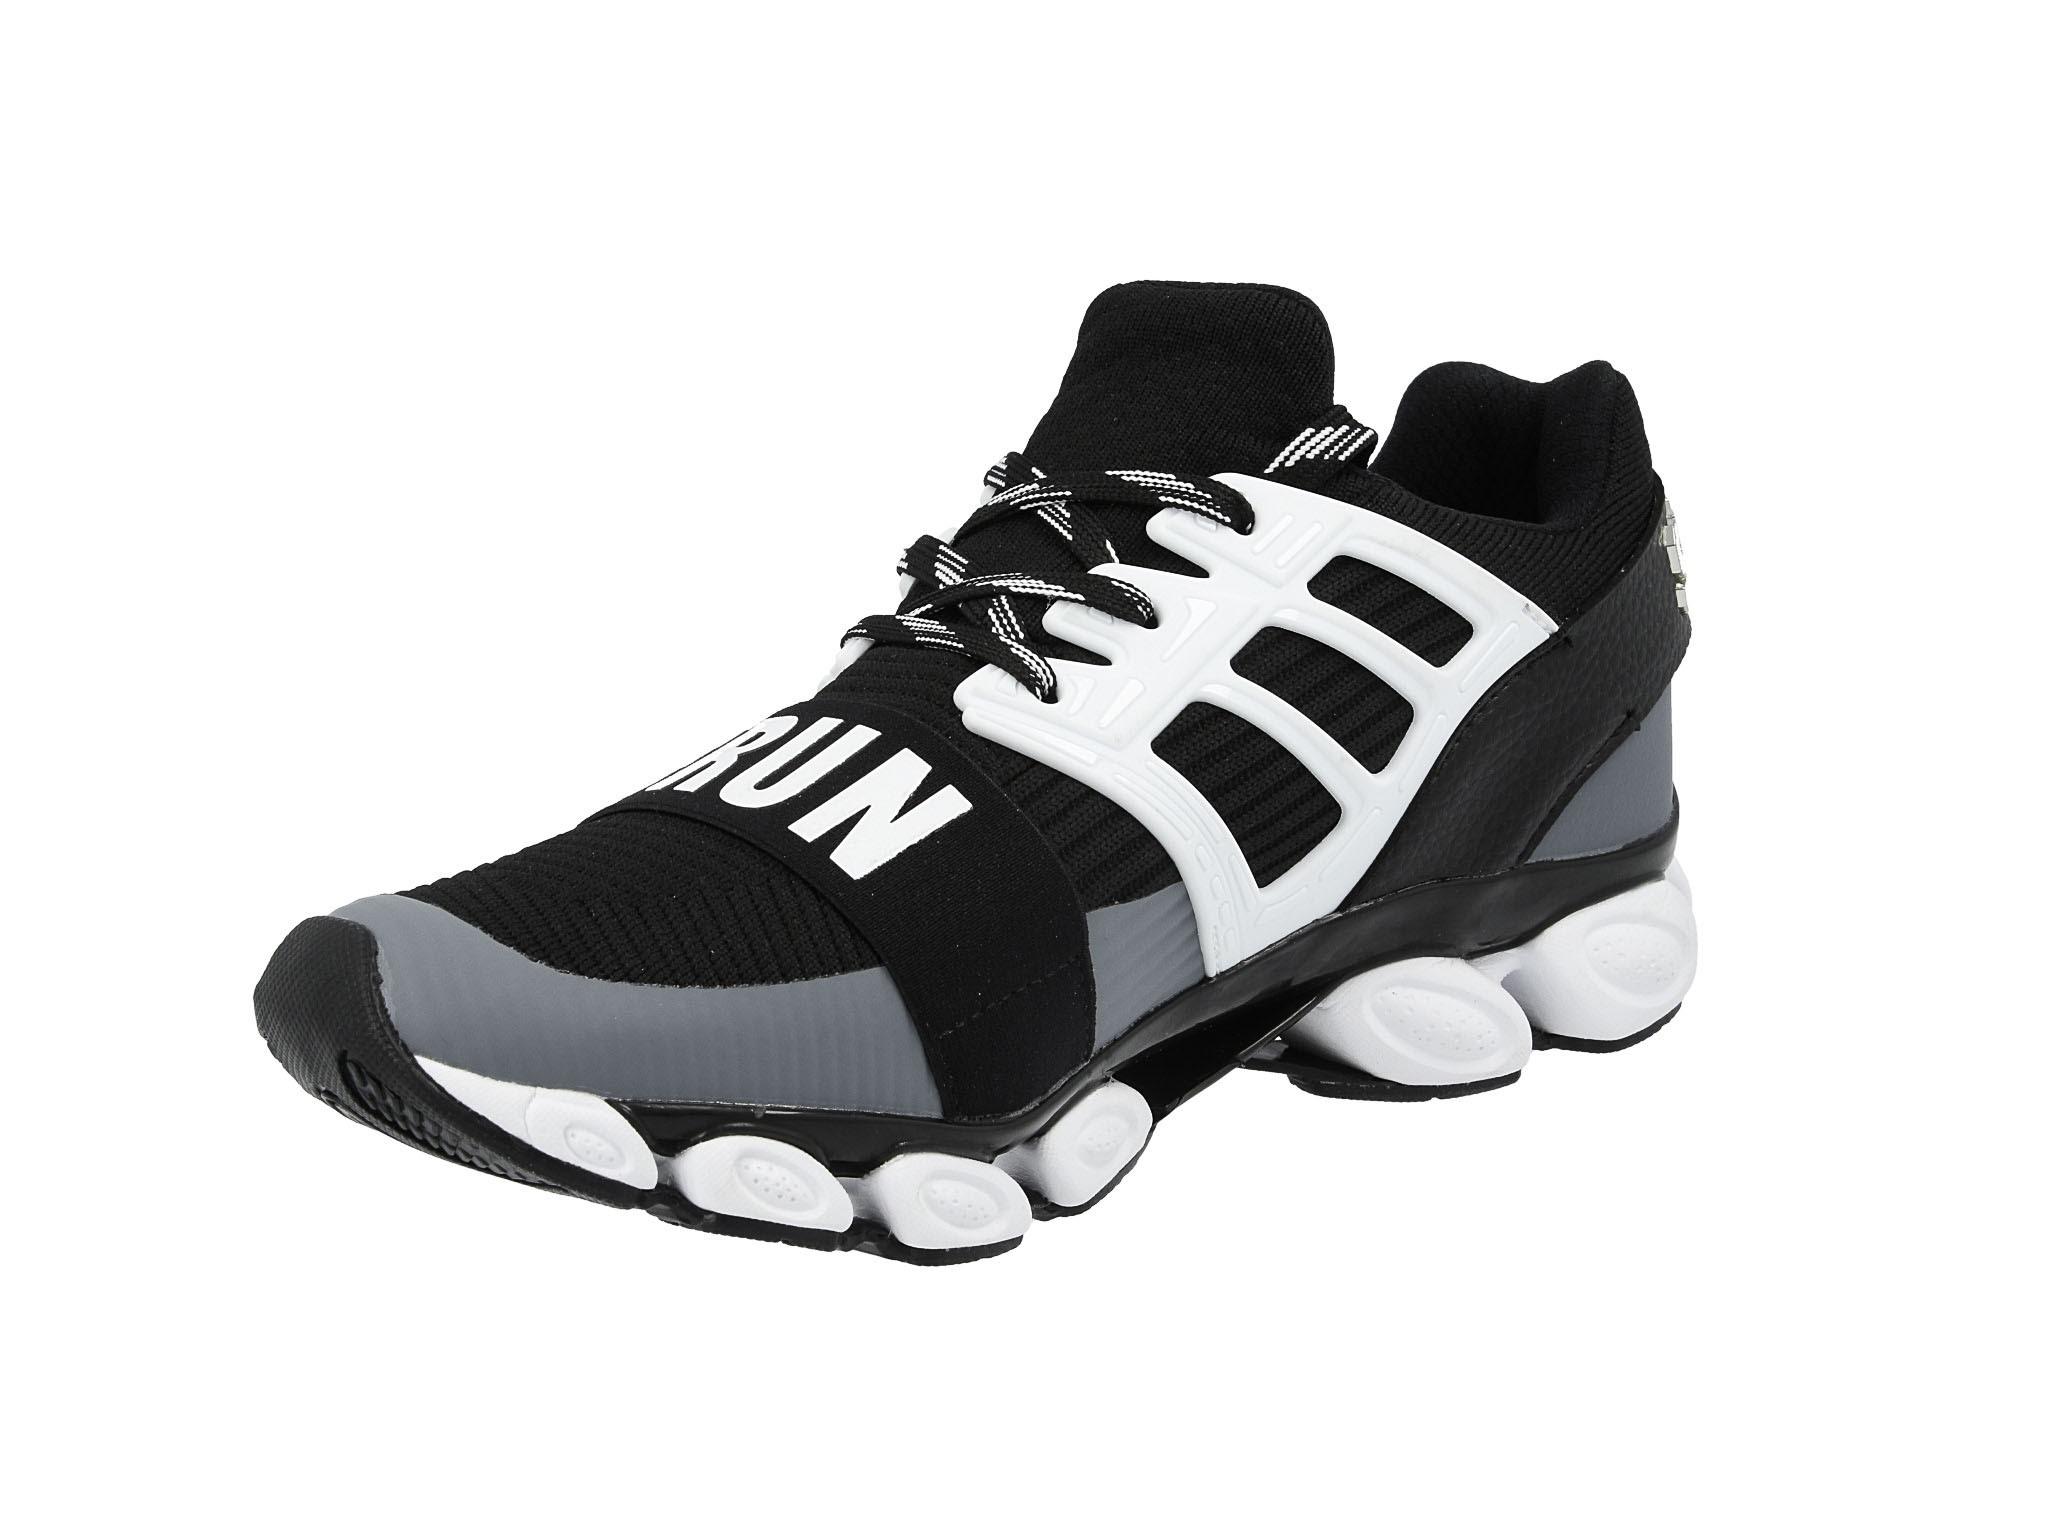 Sneakers PLEIN SPORT - Runner Original A19S USC0012 SXV002N Black/White 0201 - Sneakers - Chaussures basses - Homme